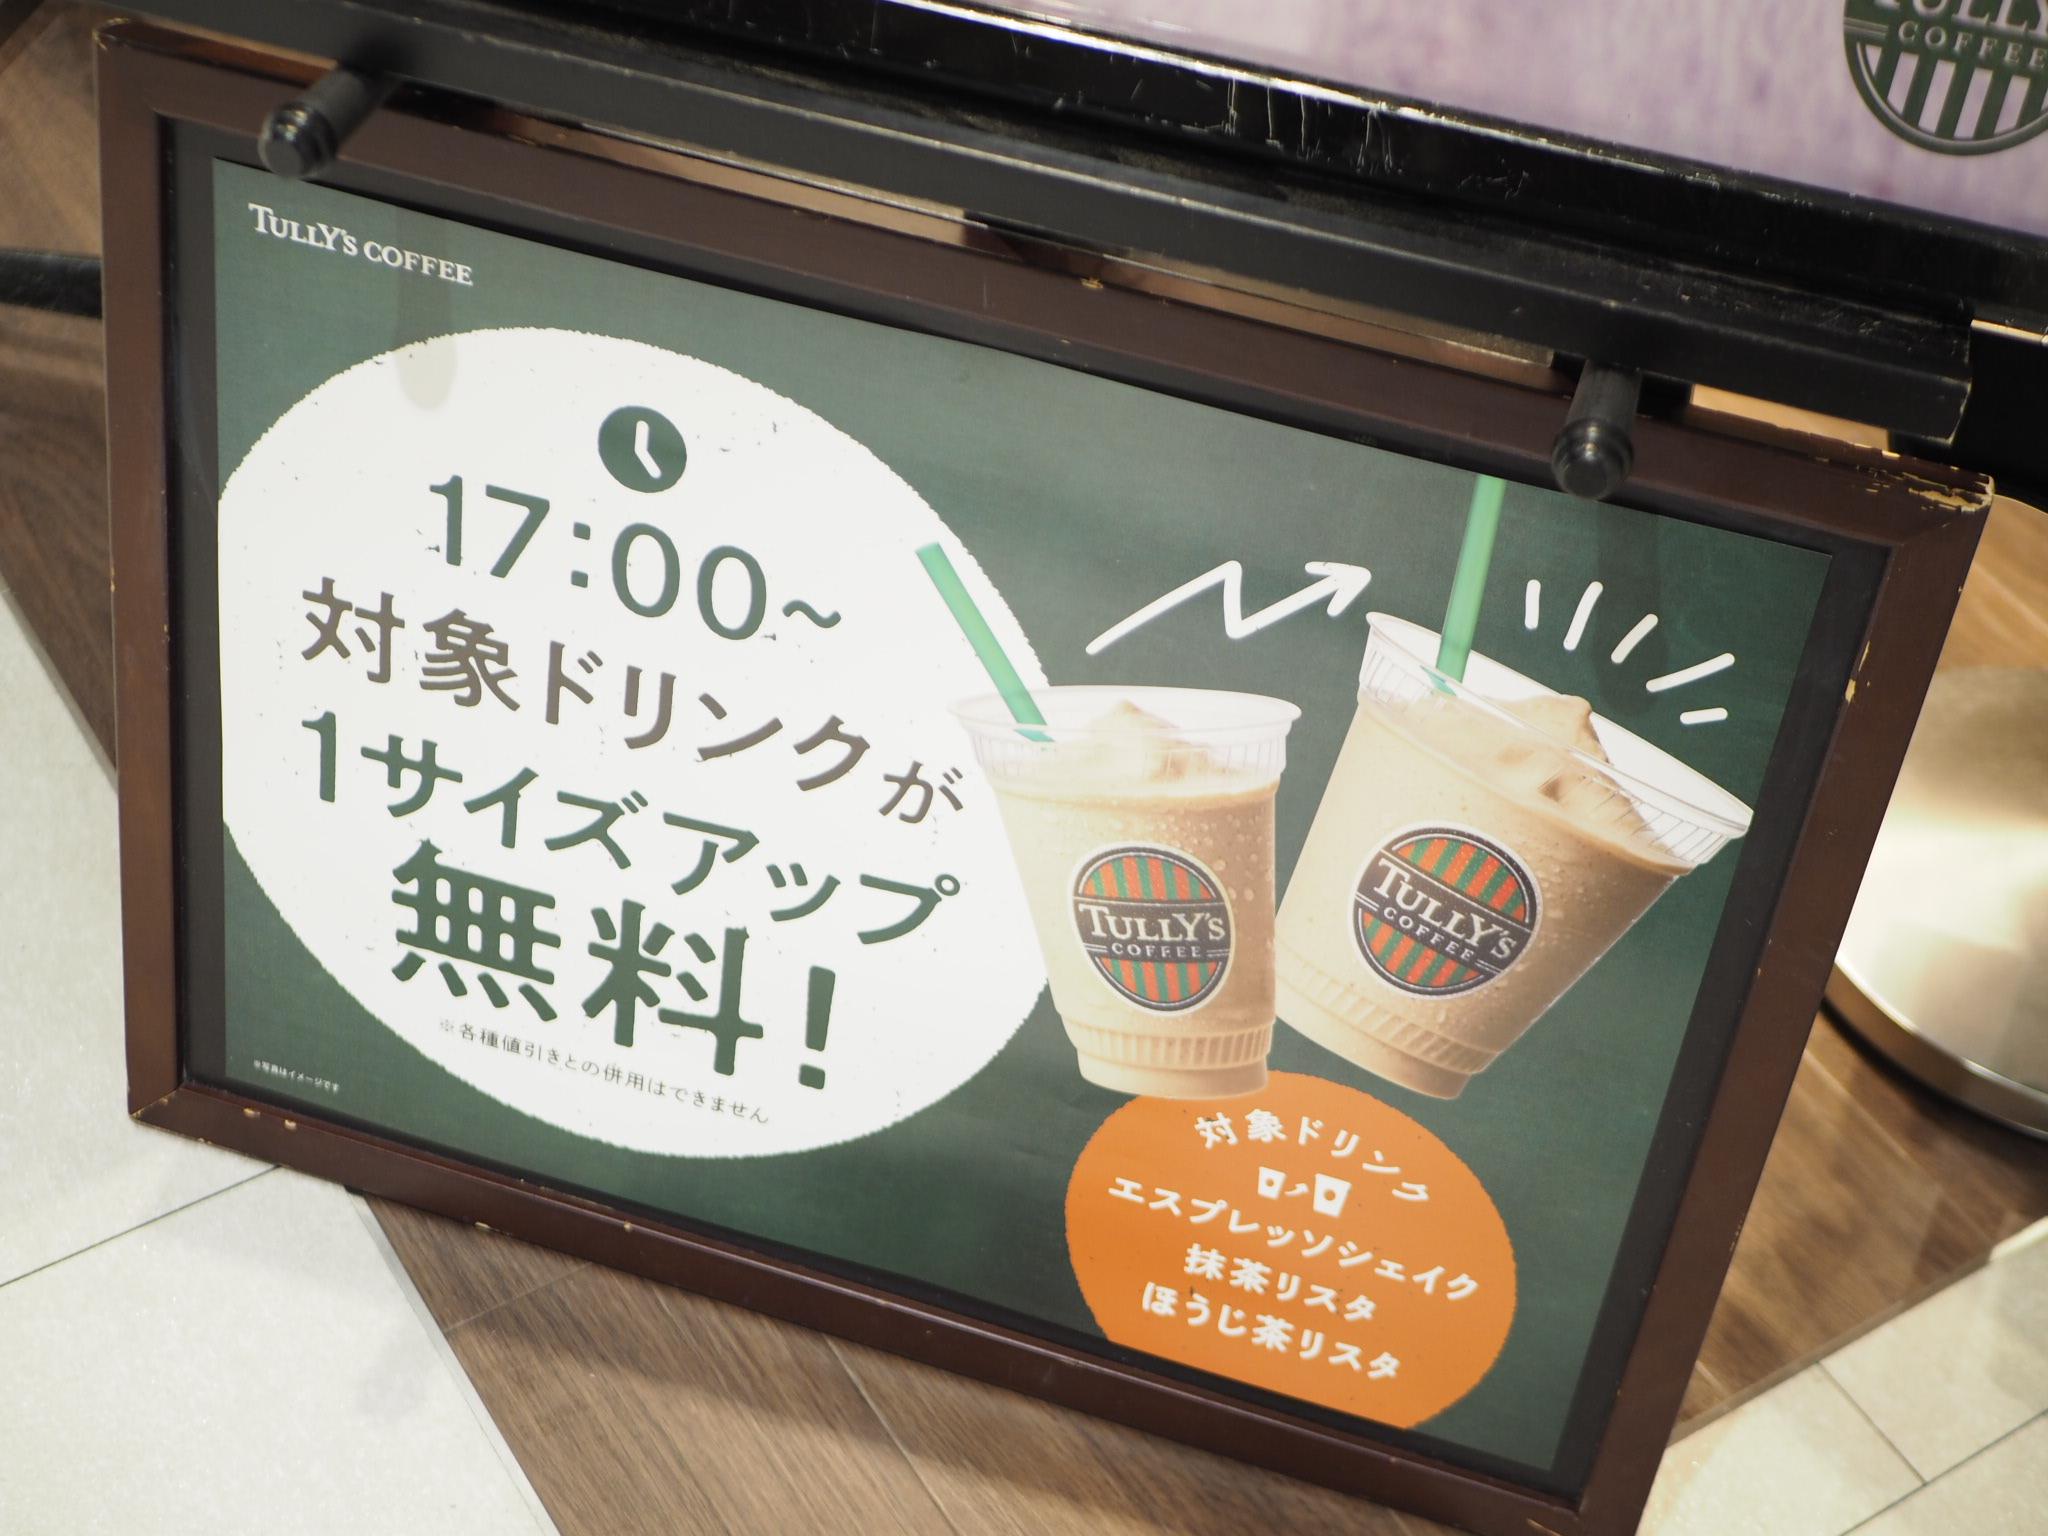 【TULLY'S COFFEE】濃厚フローズンドリンク「抹茶リスタ」&「ほうじ茶リスタ」が待望のレギュラーメニューに❤︎_5